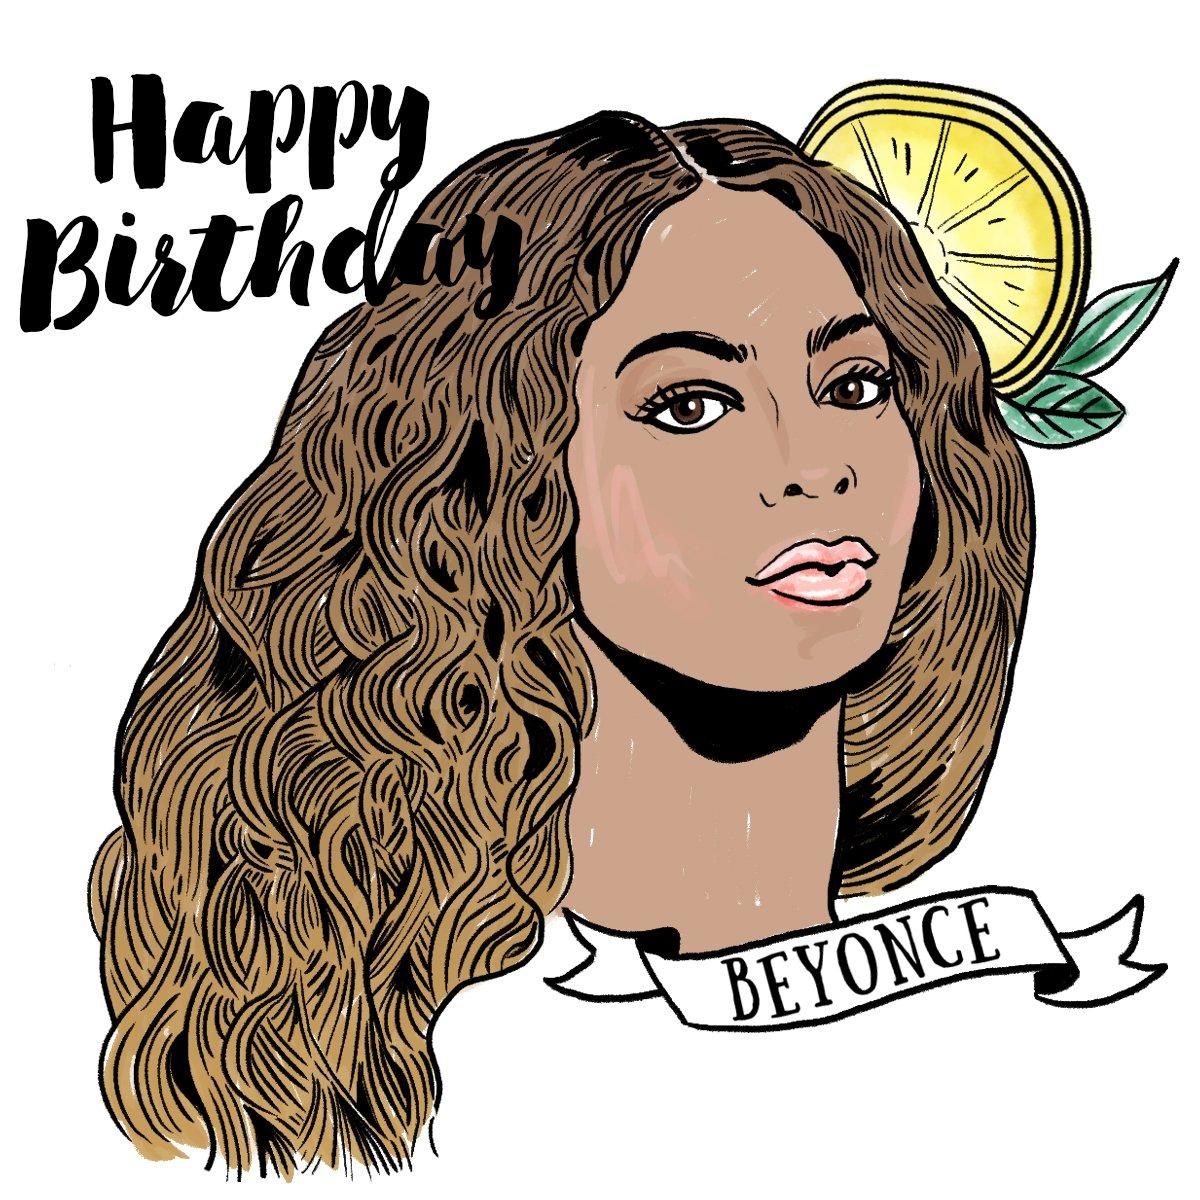 Happy birthday, Beyoncé!!!